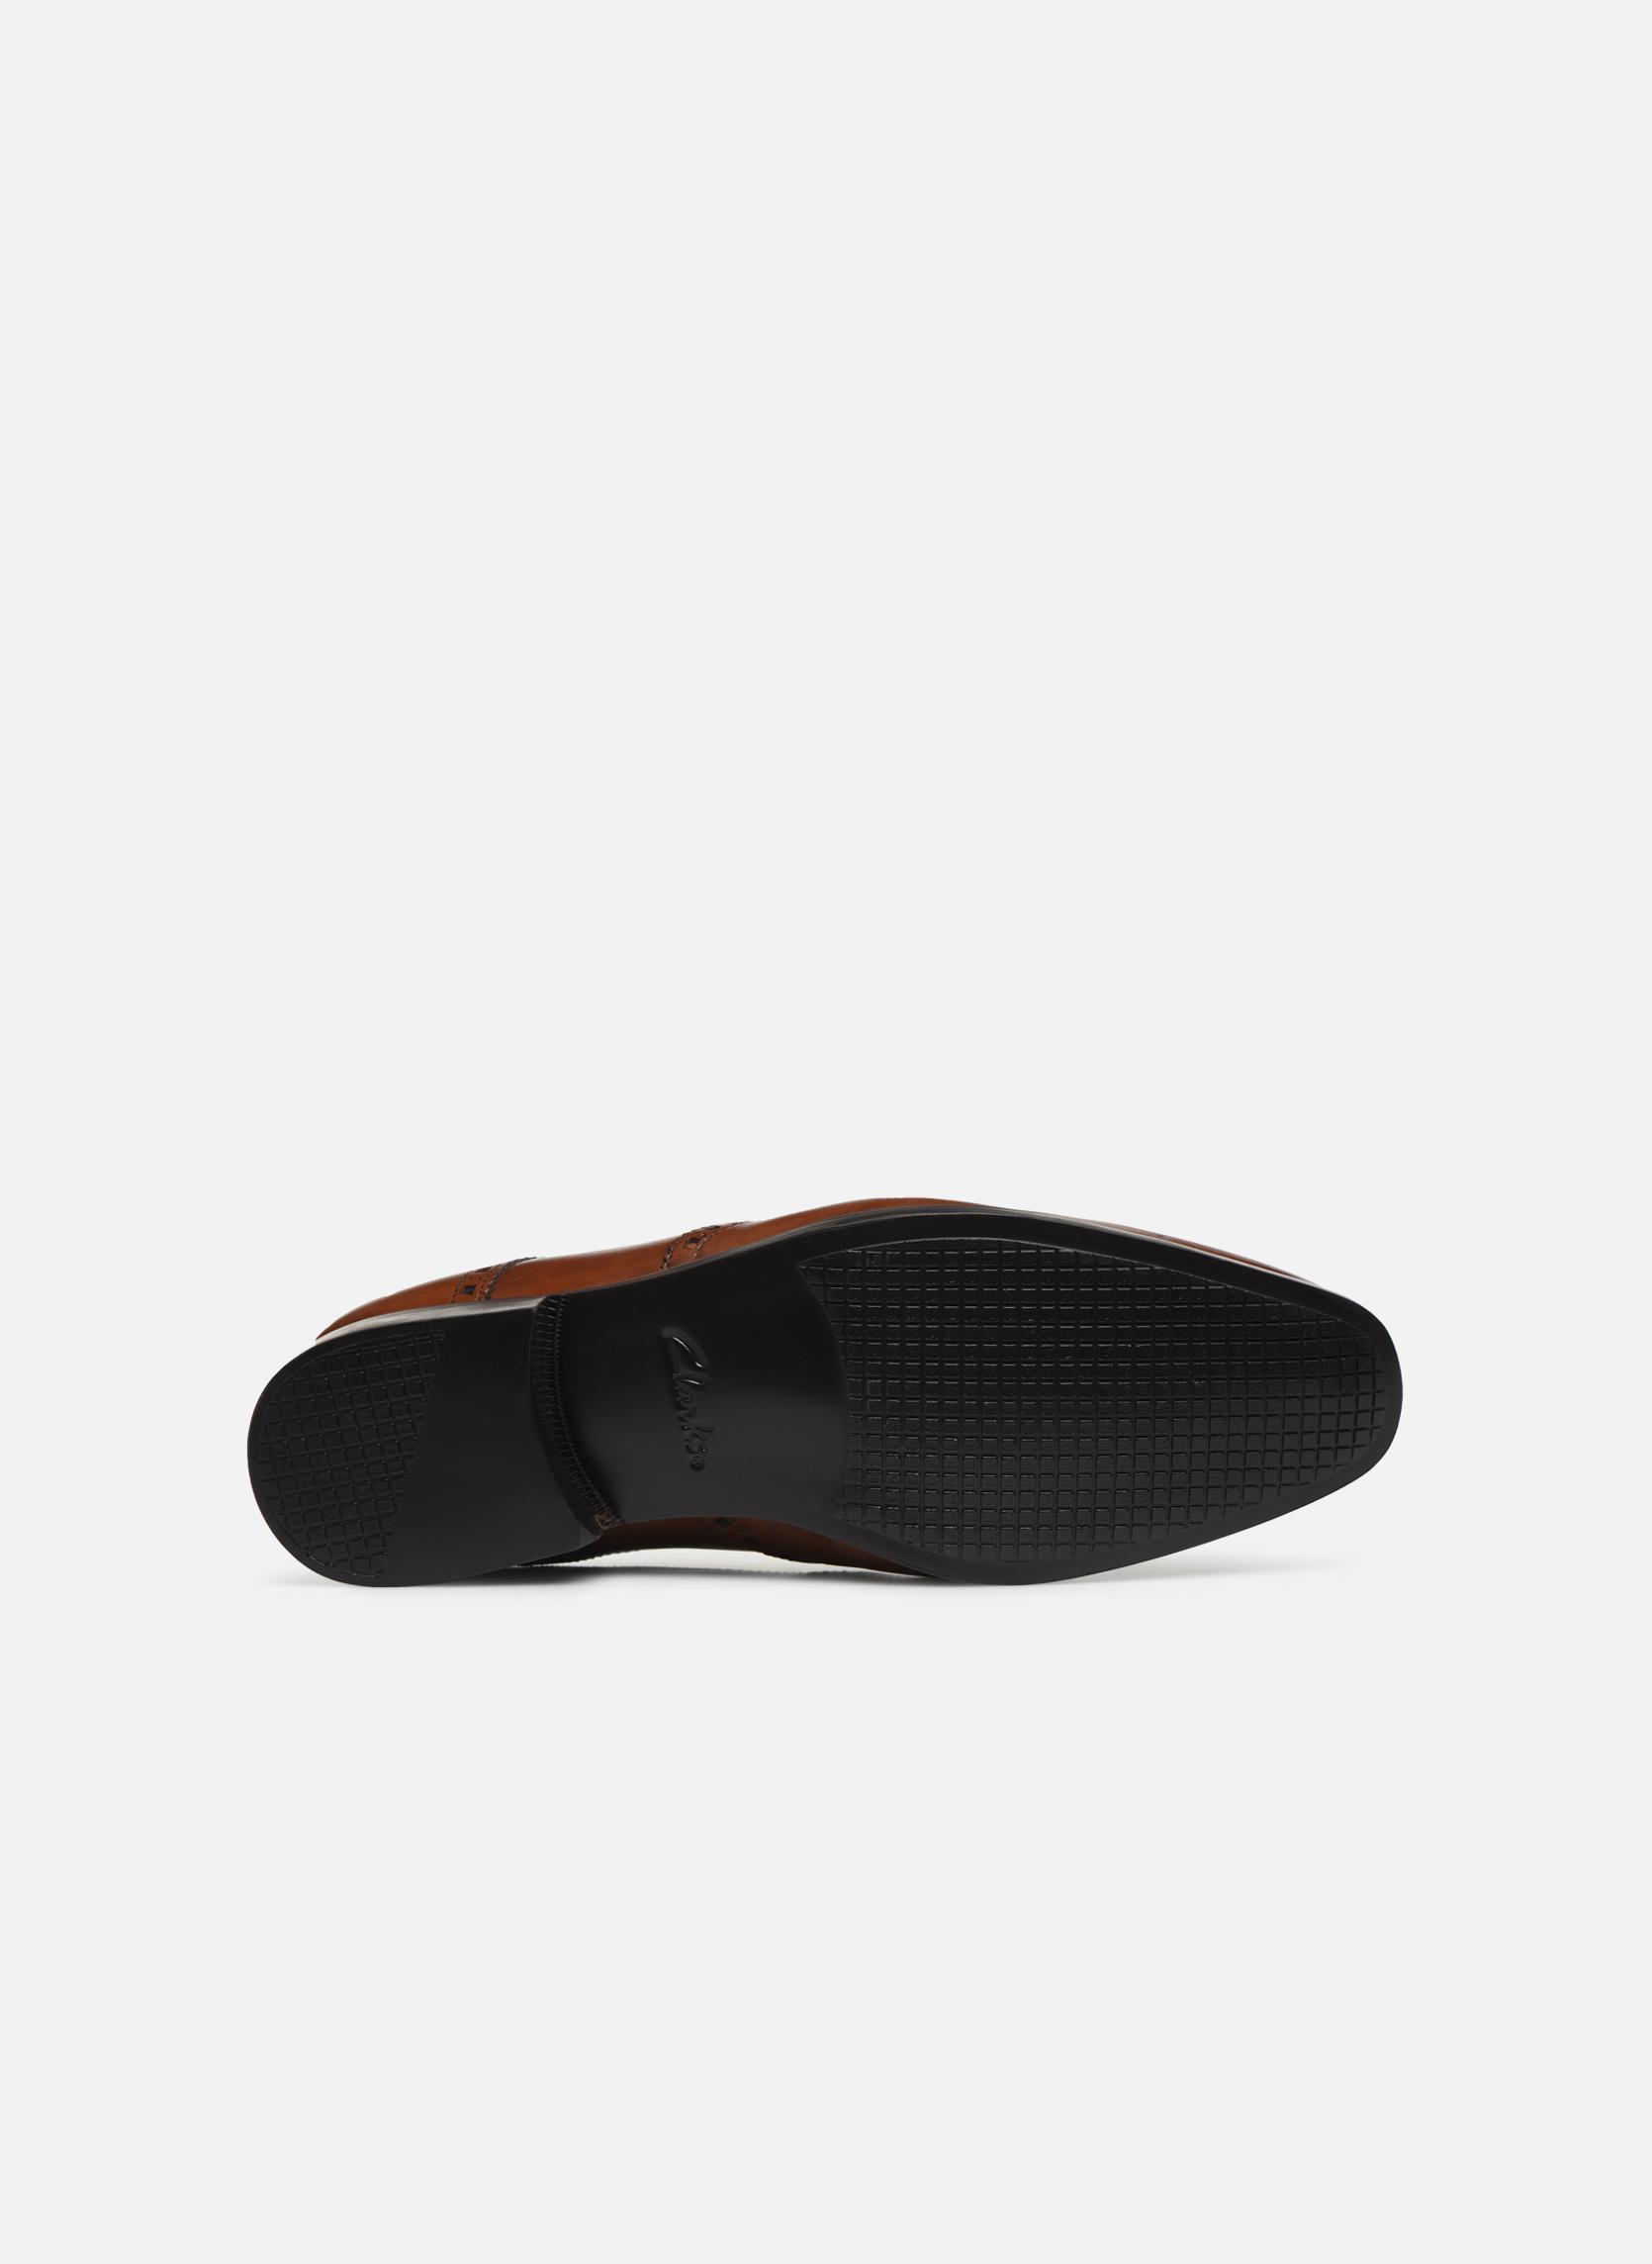 Amieson Limit Tan Leather